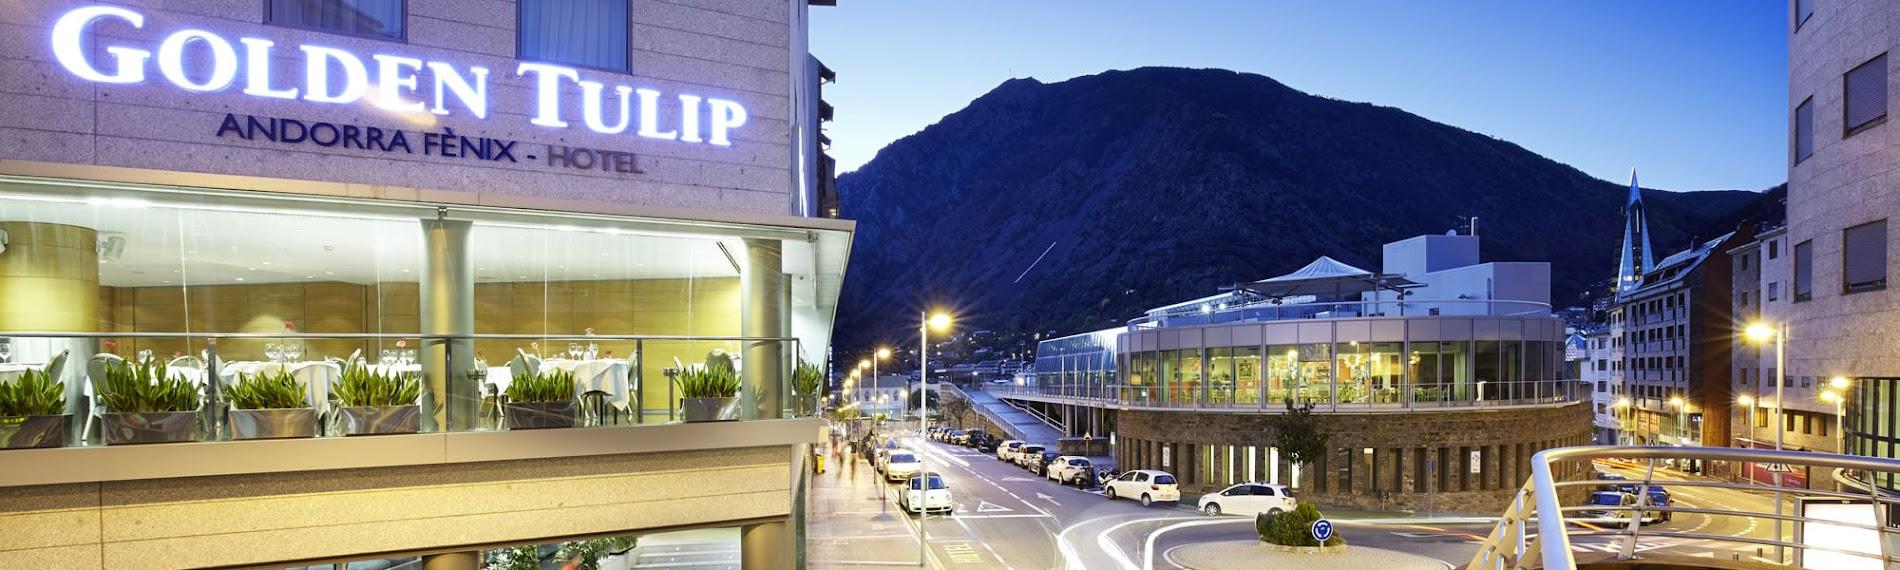 hoteles en Andprra